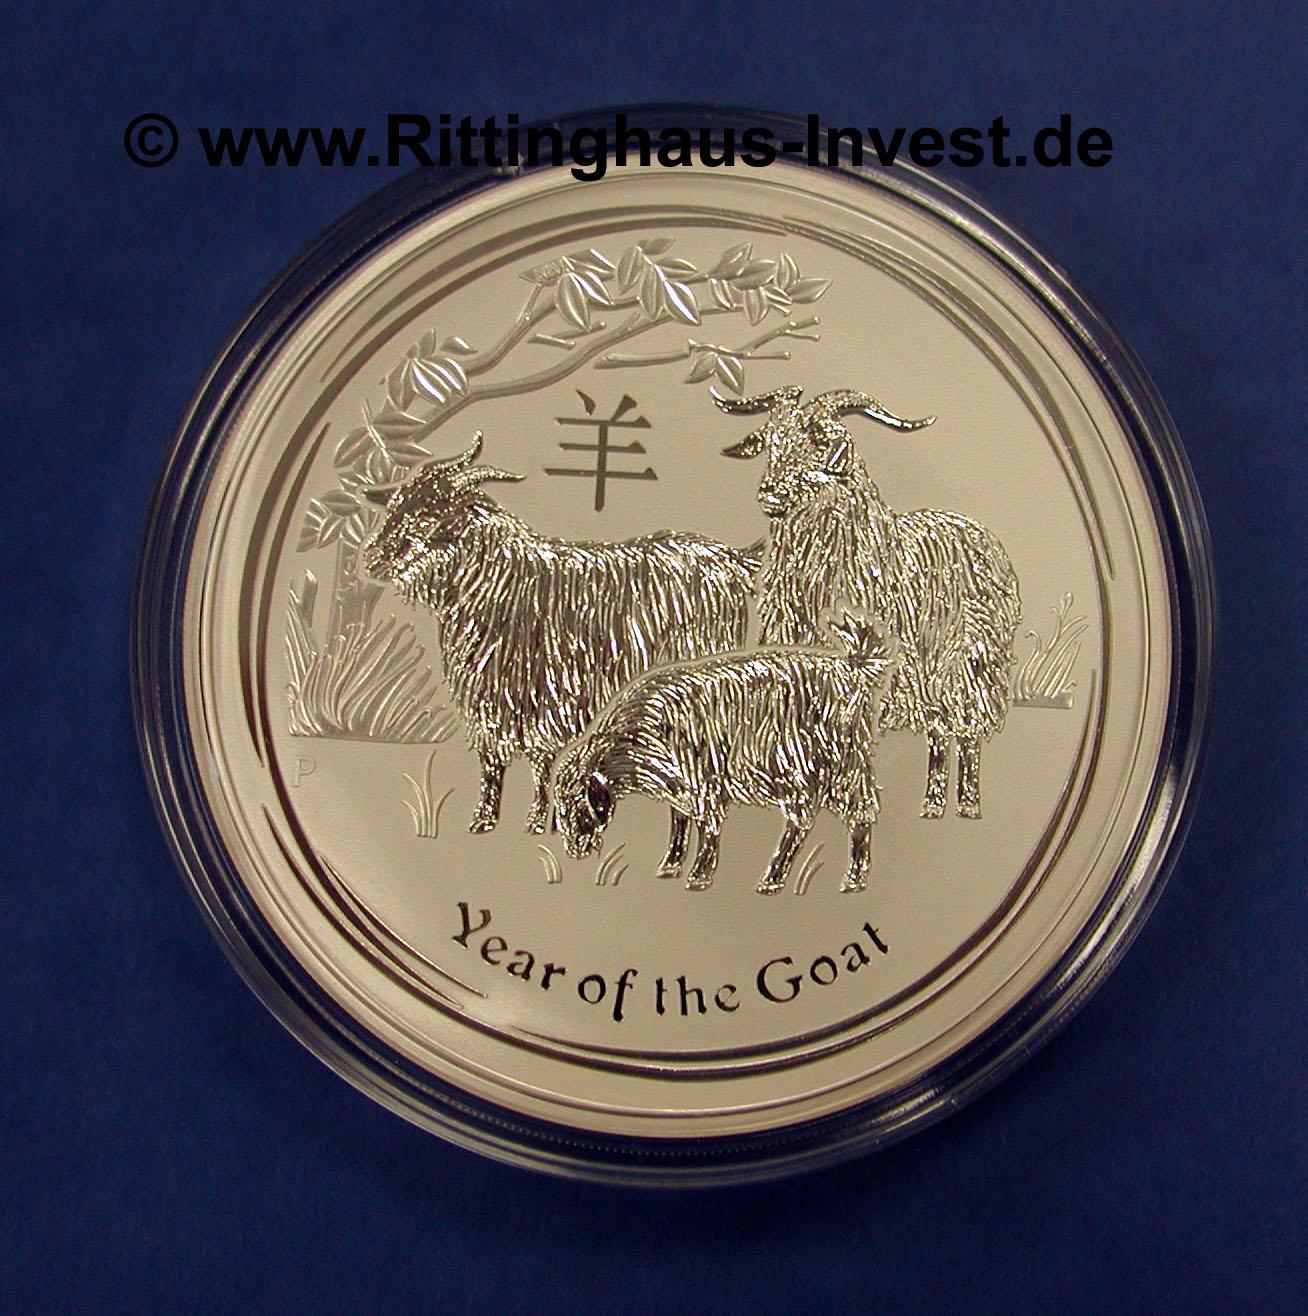 Lunar Ii Ziege 2015 Silberm 252 Nze 1 Kg Silber